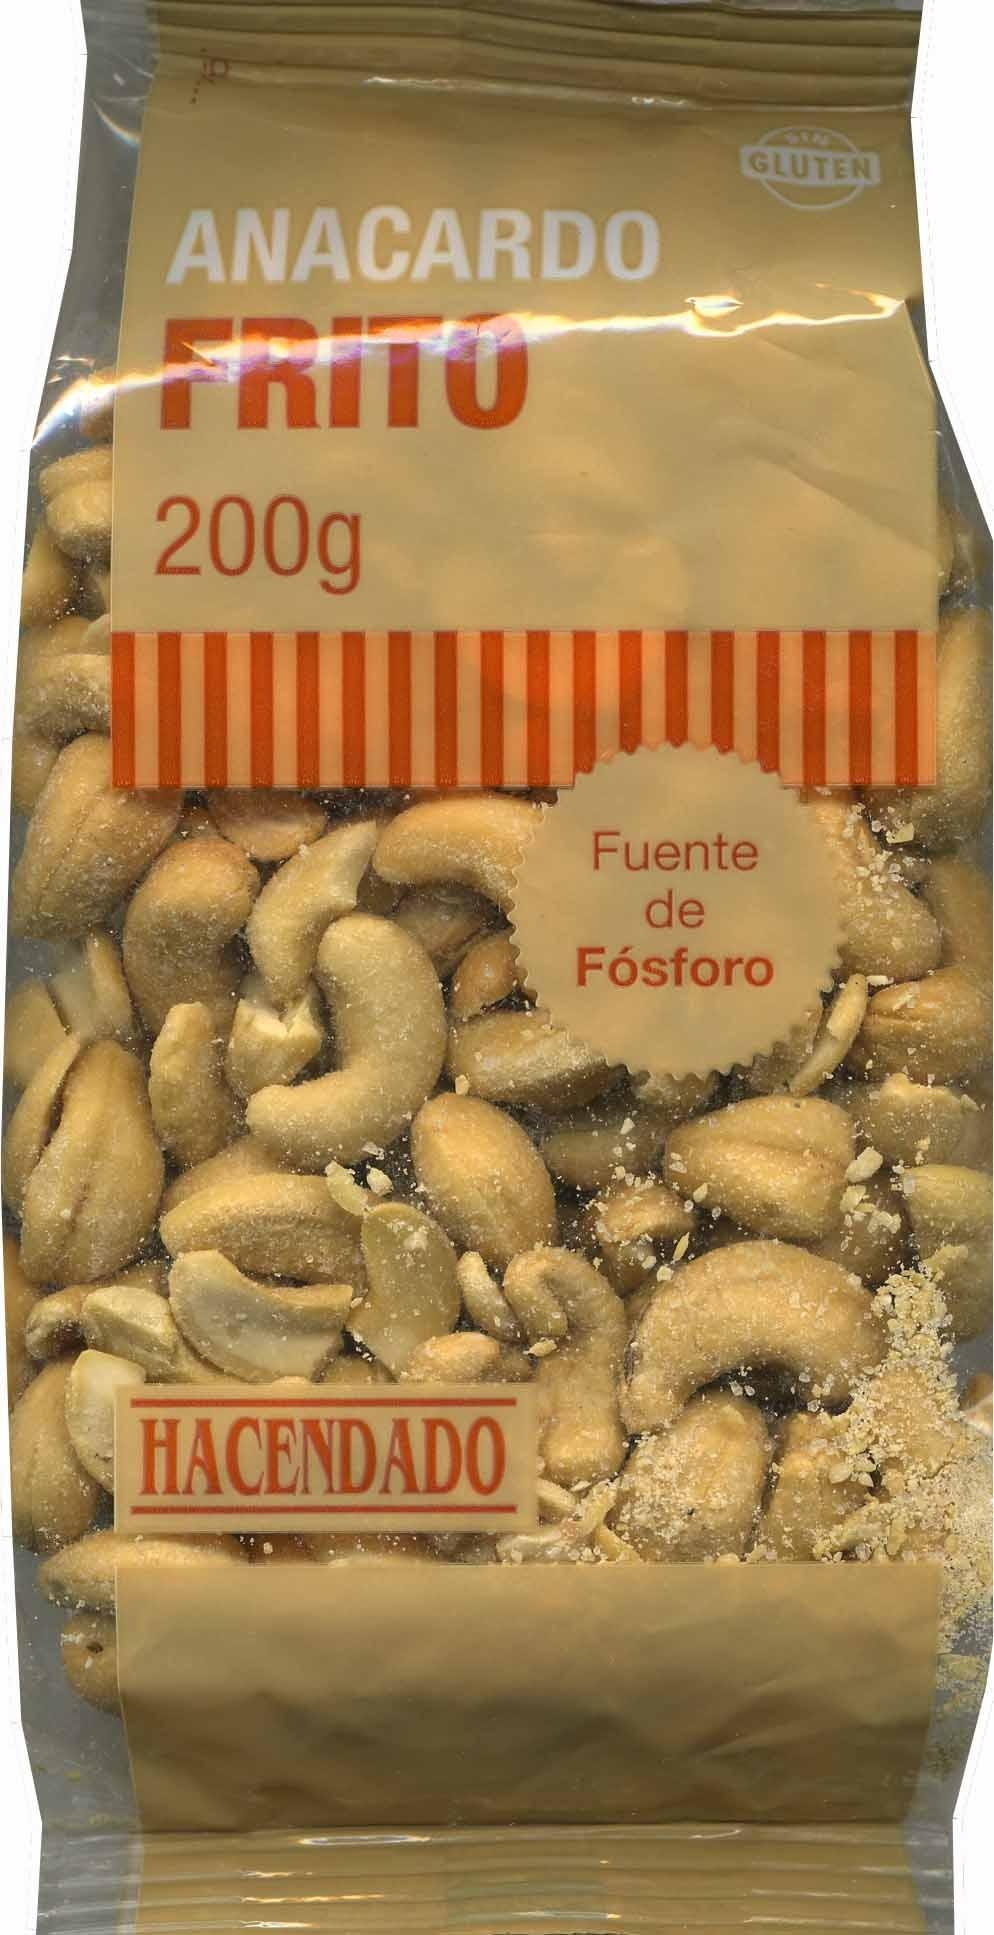 Anacardo frito - Product - es